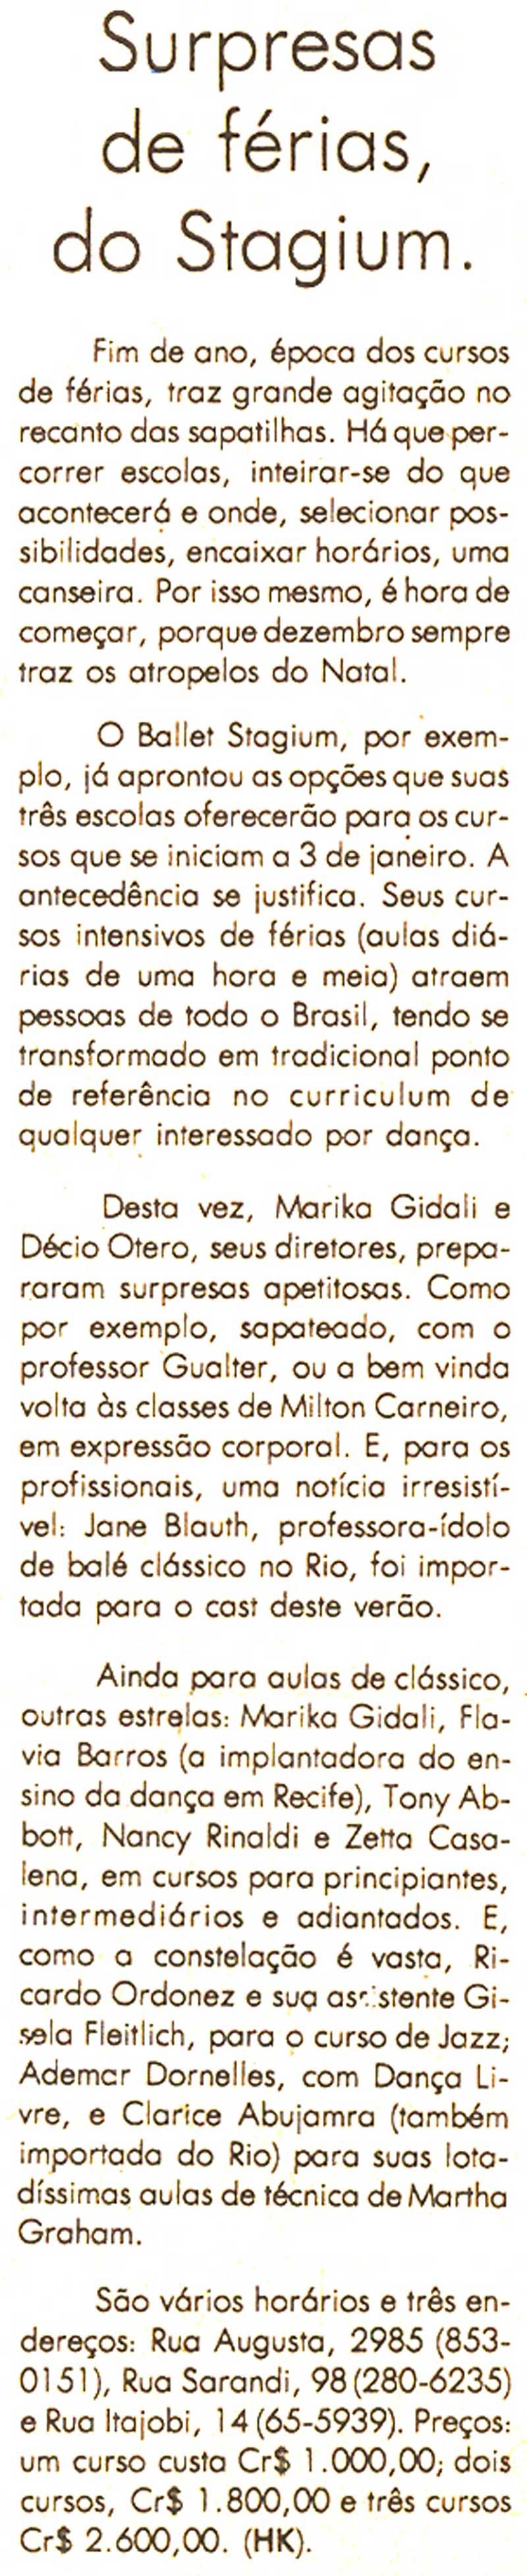 742d3b3dc04a9 veículo  Jornal da Tarde ...